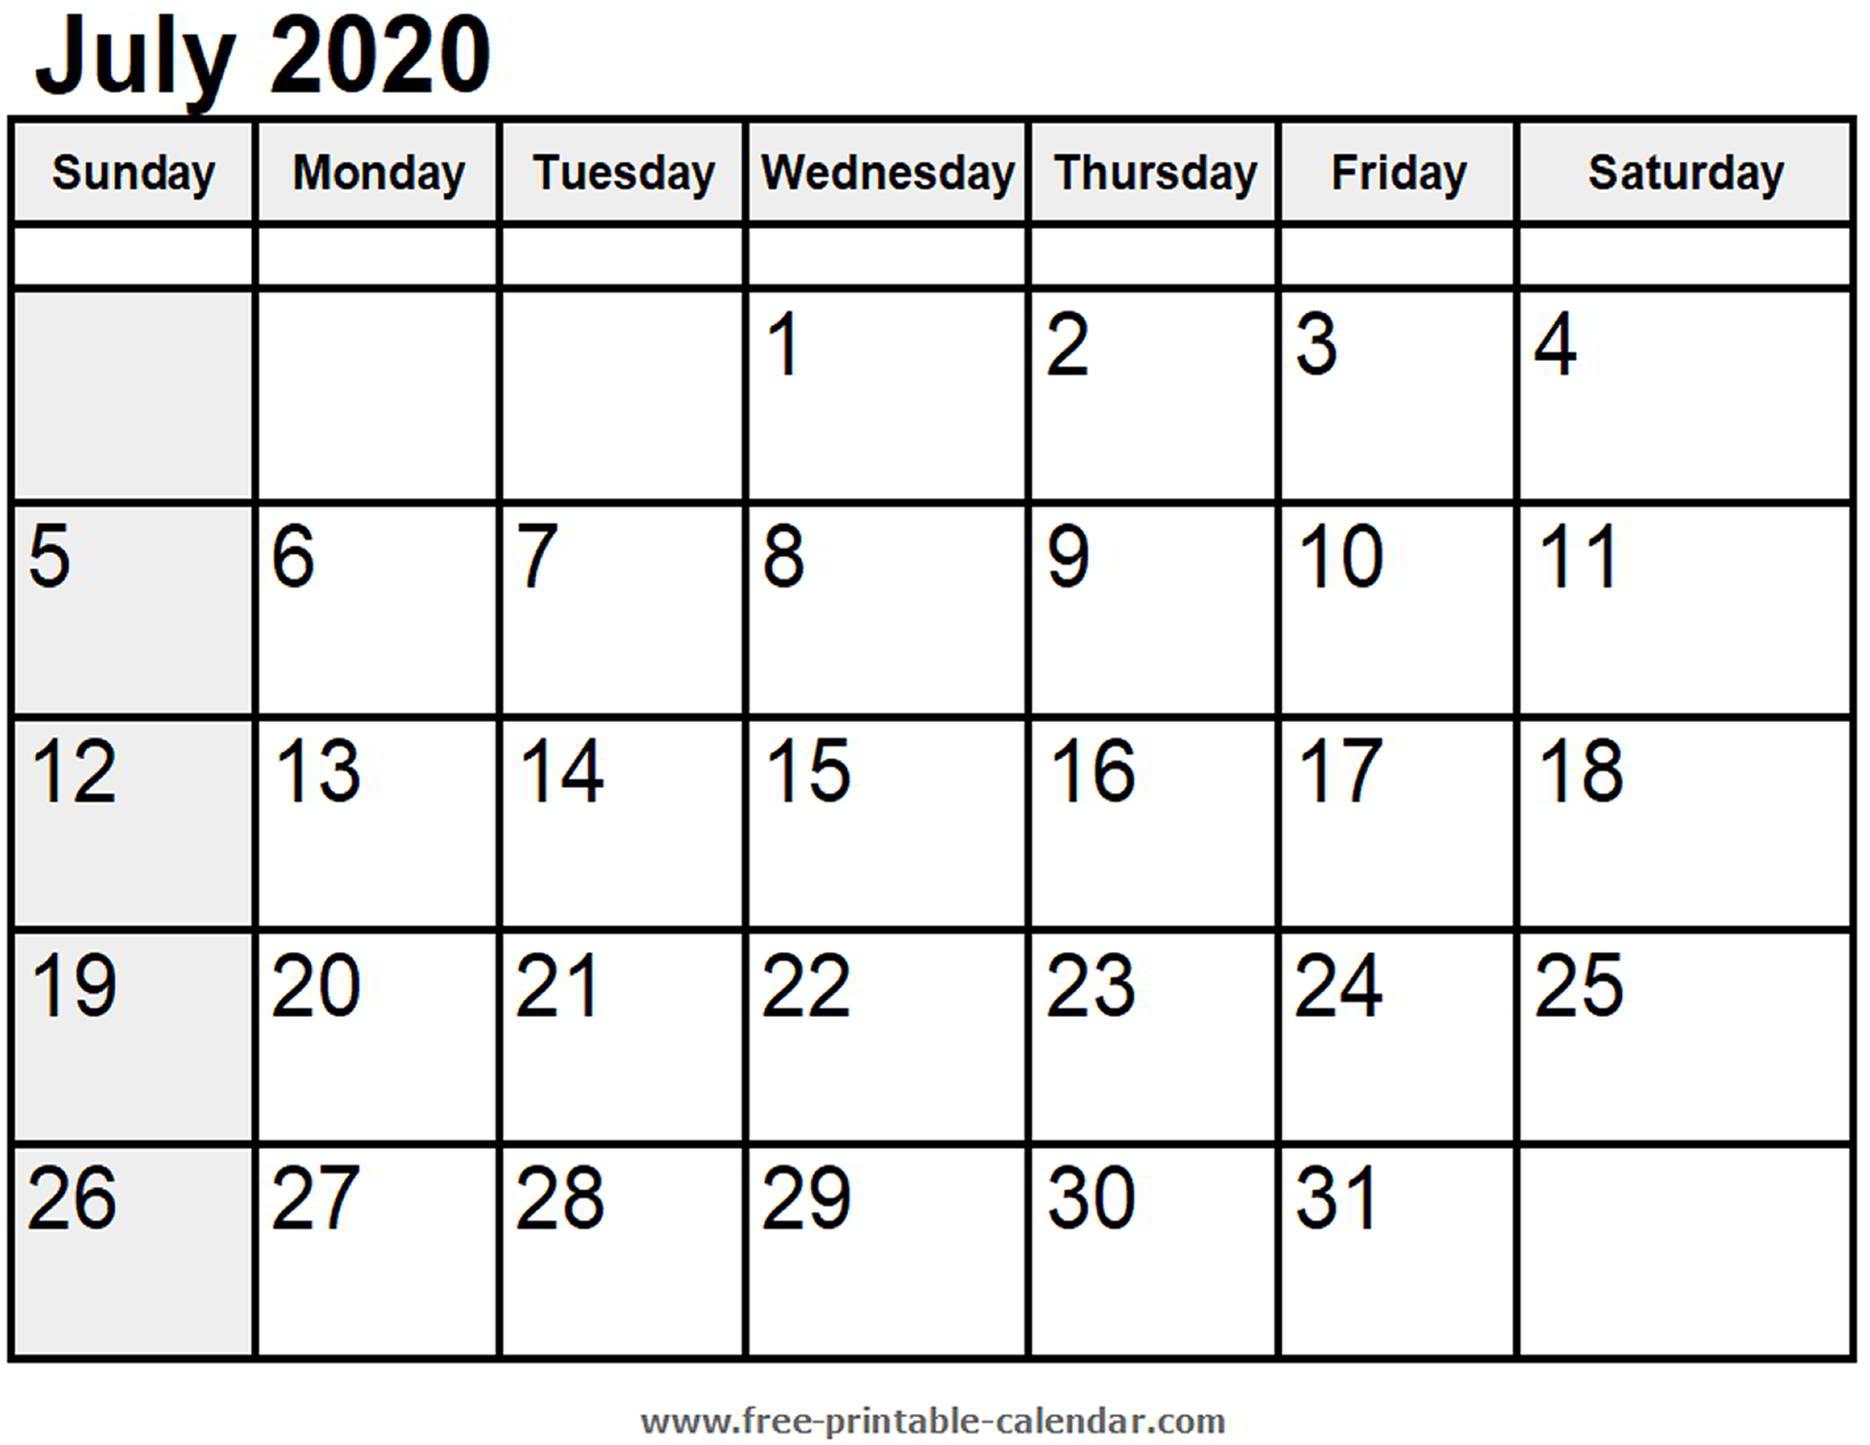 Calendar July 2020 - Free-Printable-Calendar